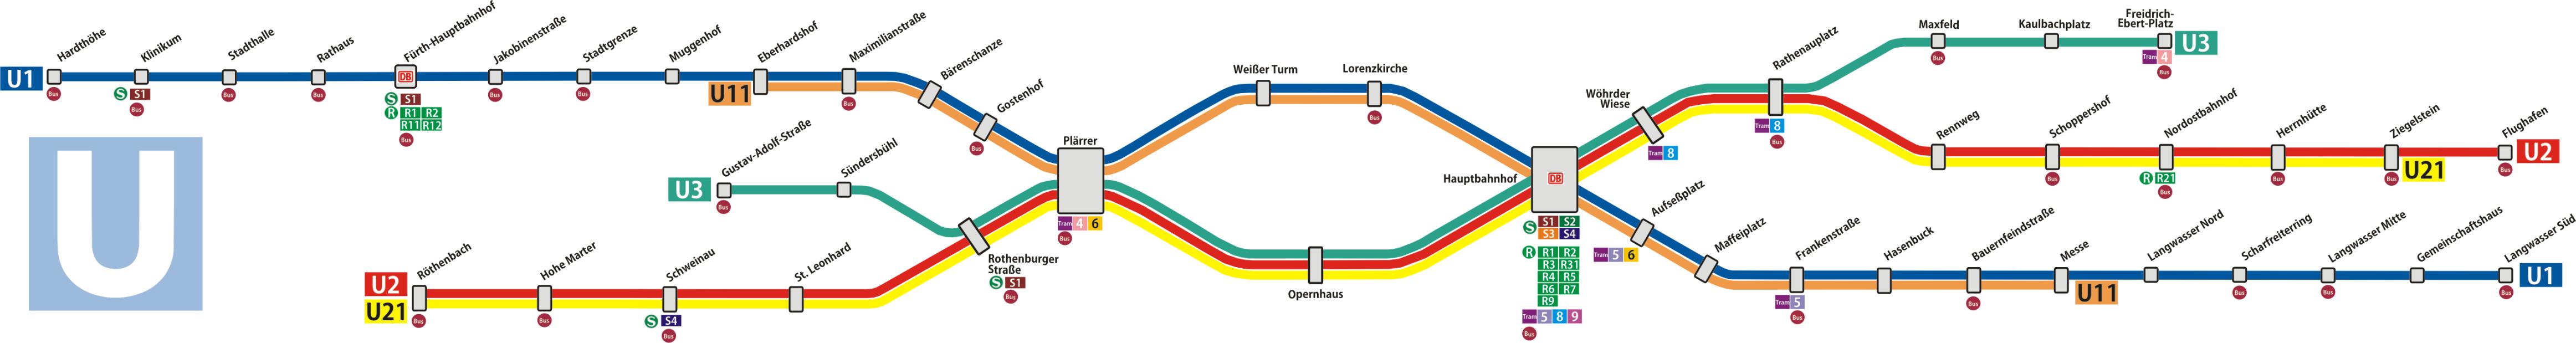 u Bahn Map Nuremberg Nuremberg Nürnberg U-bahn